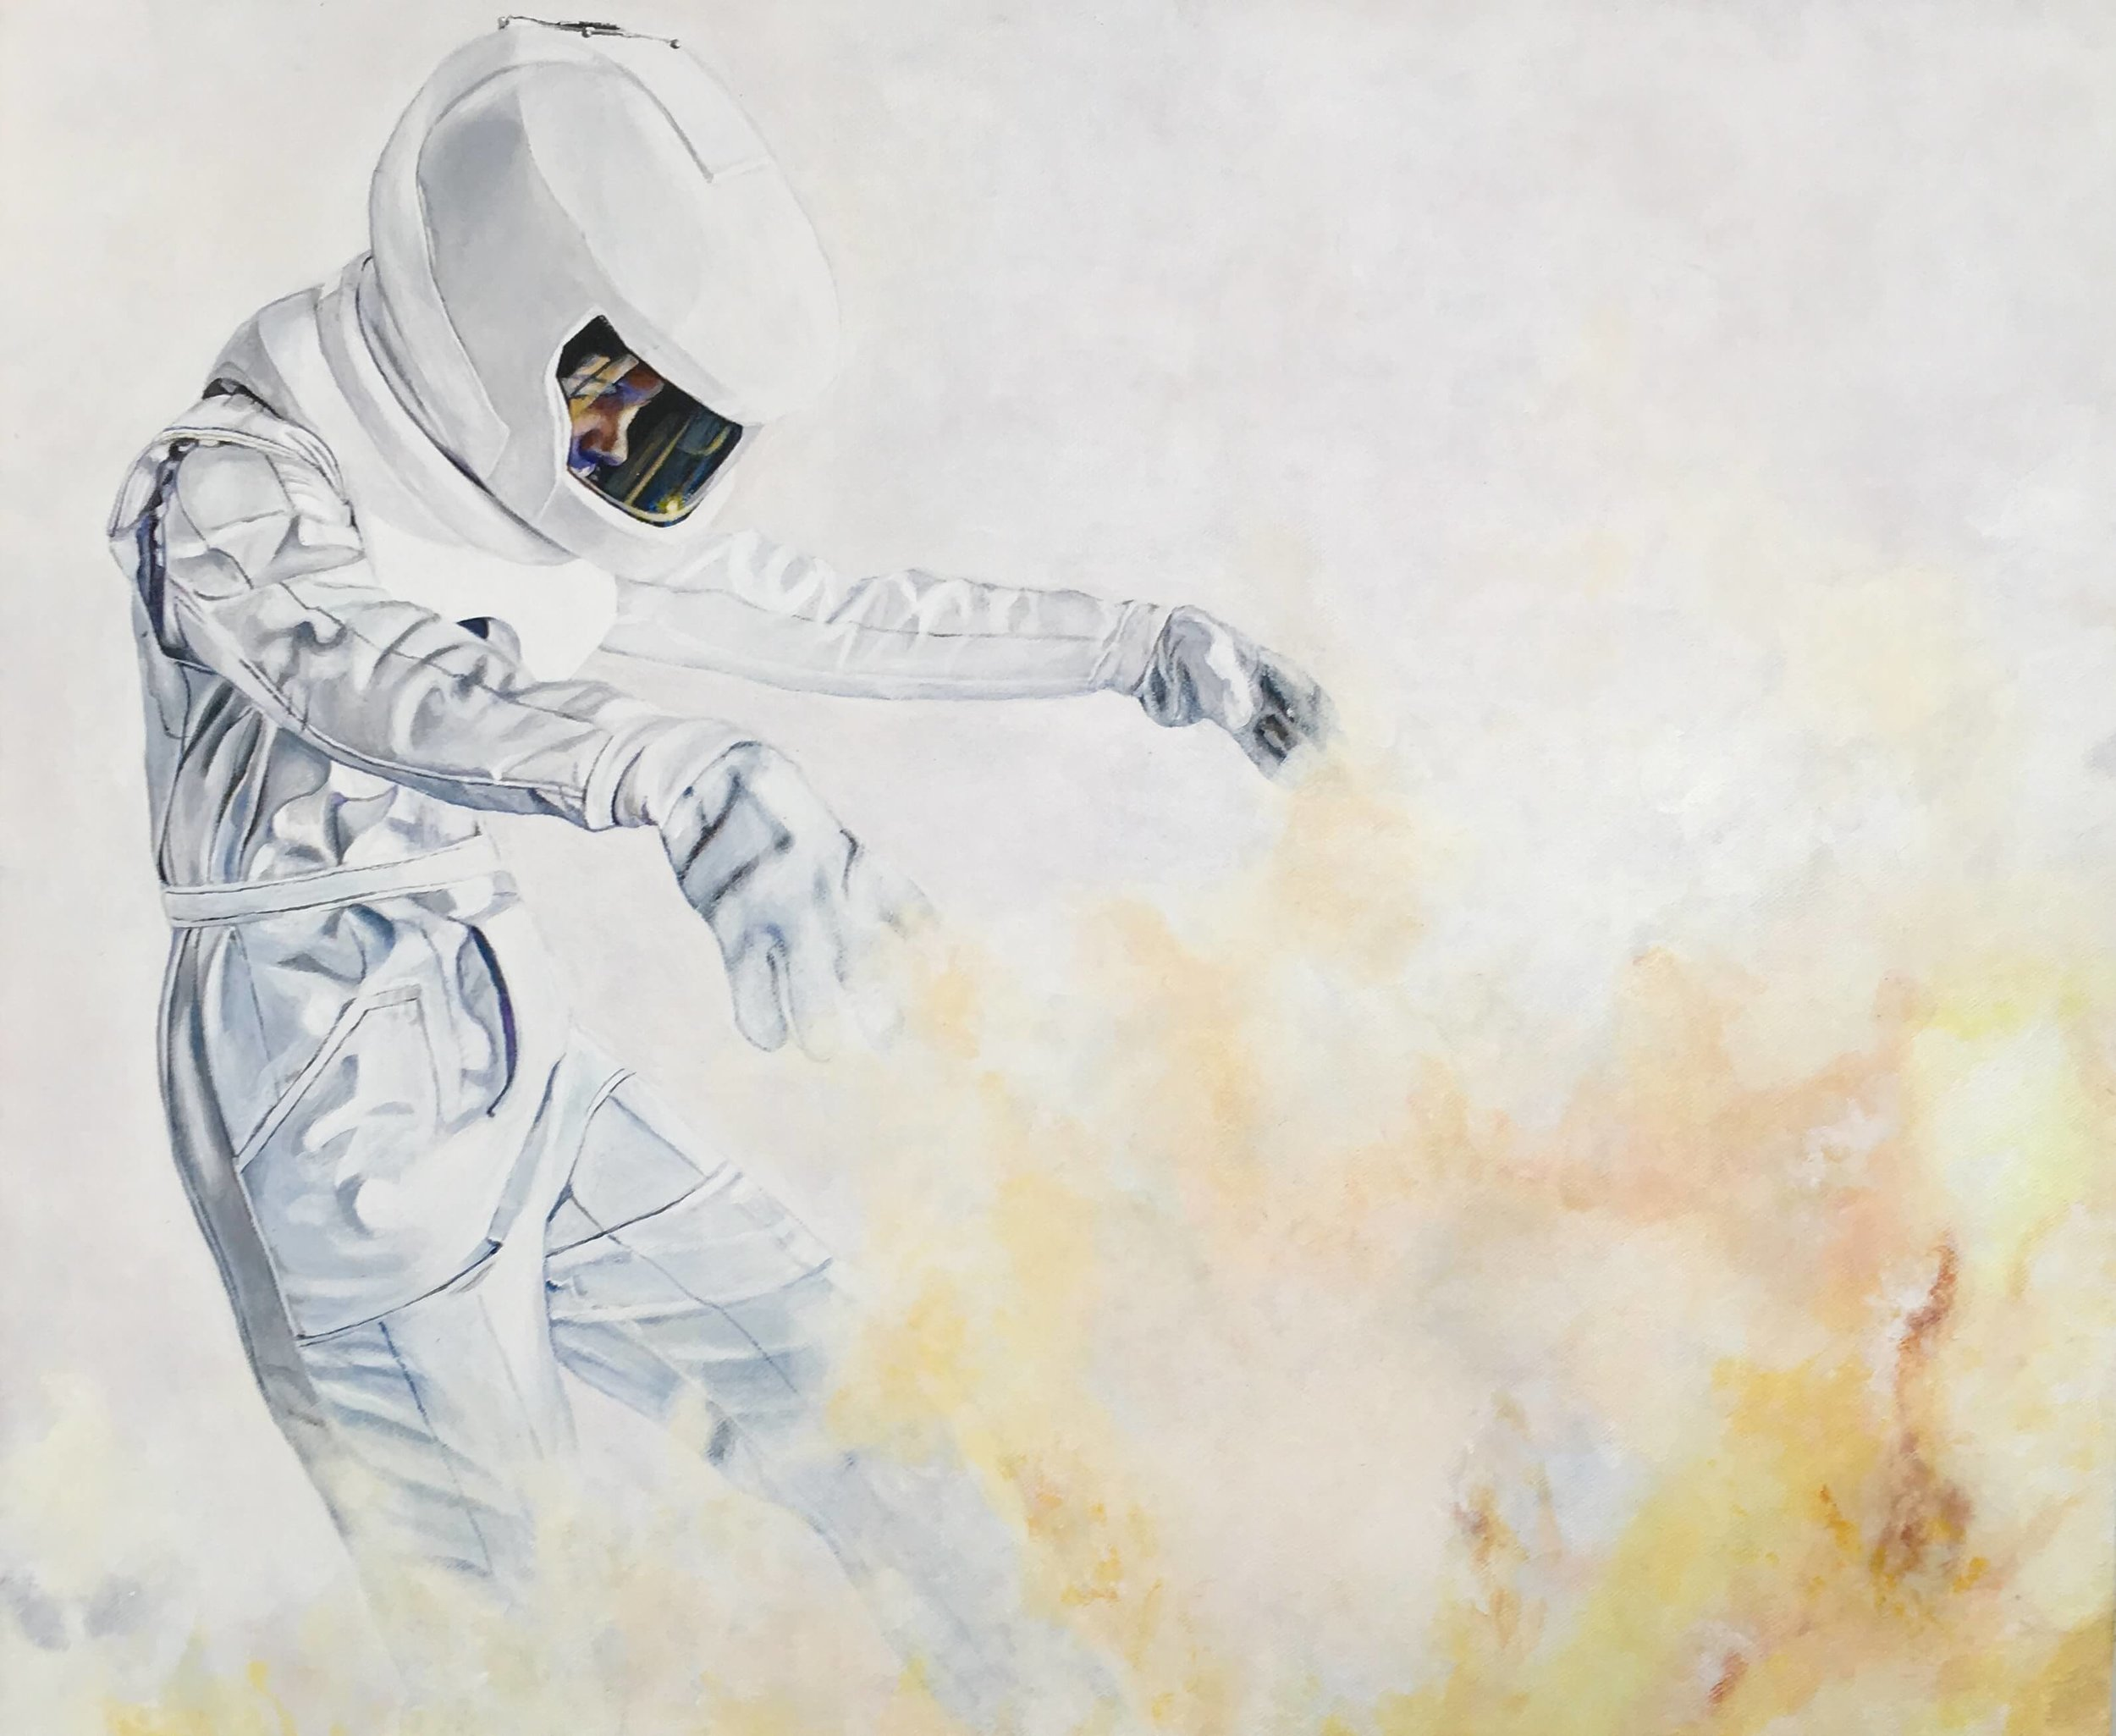 Ignite, 50x60x4 cm, © Latzke, Malerei, 2018, 1.250,-